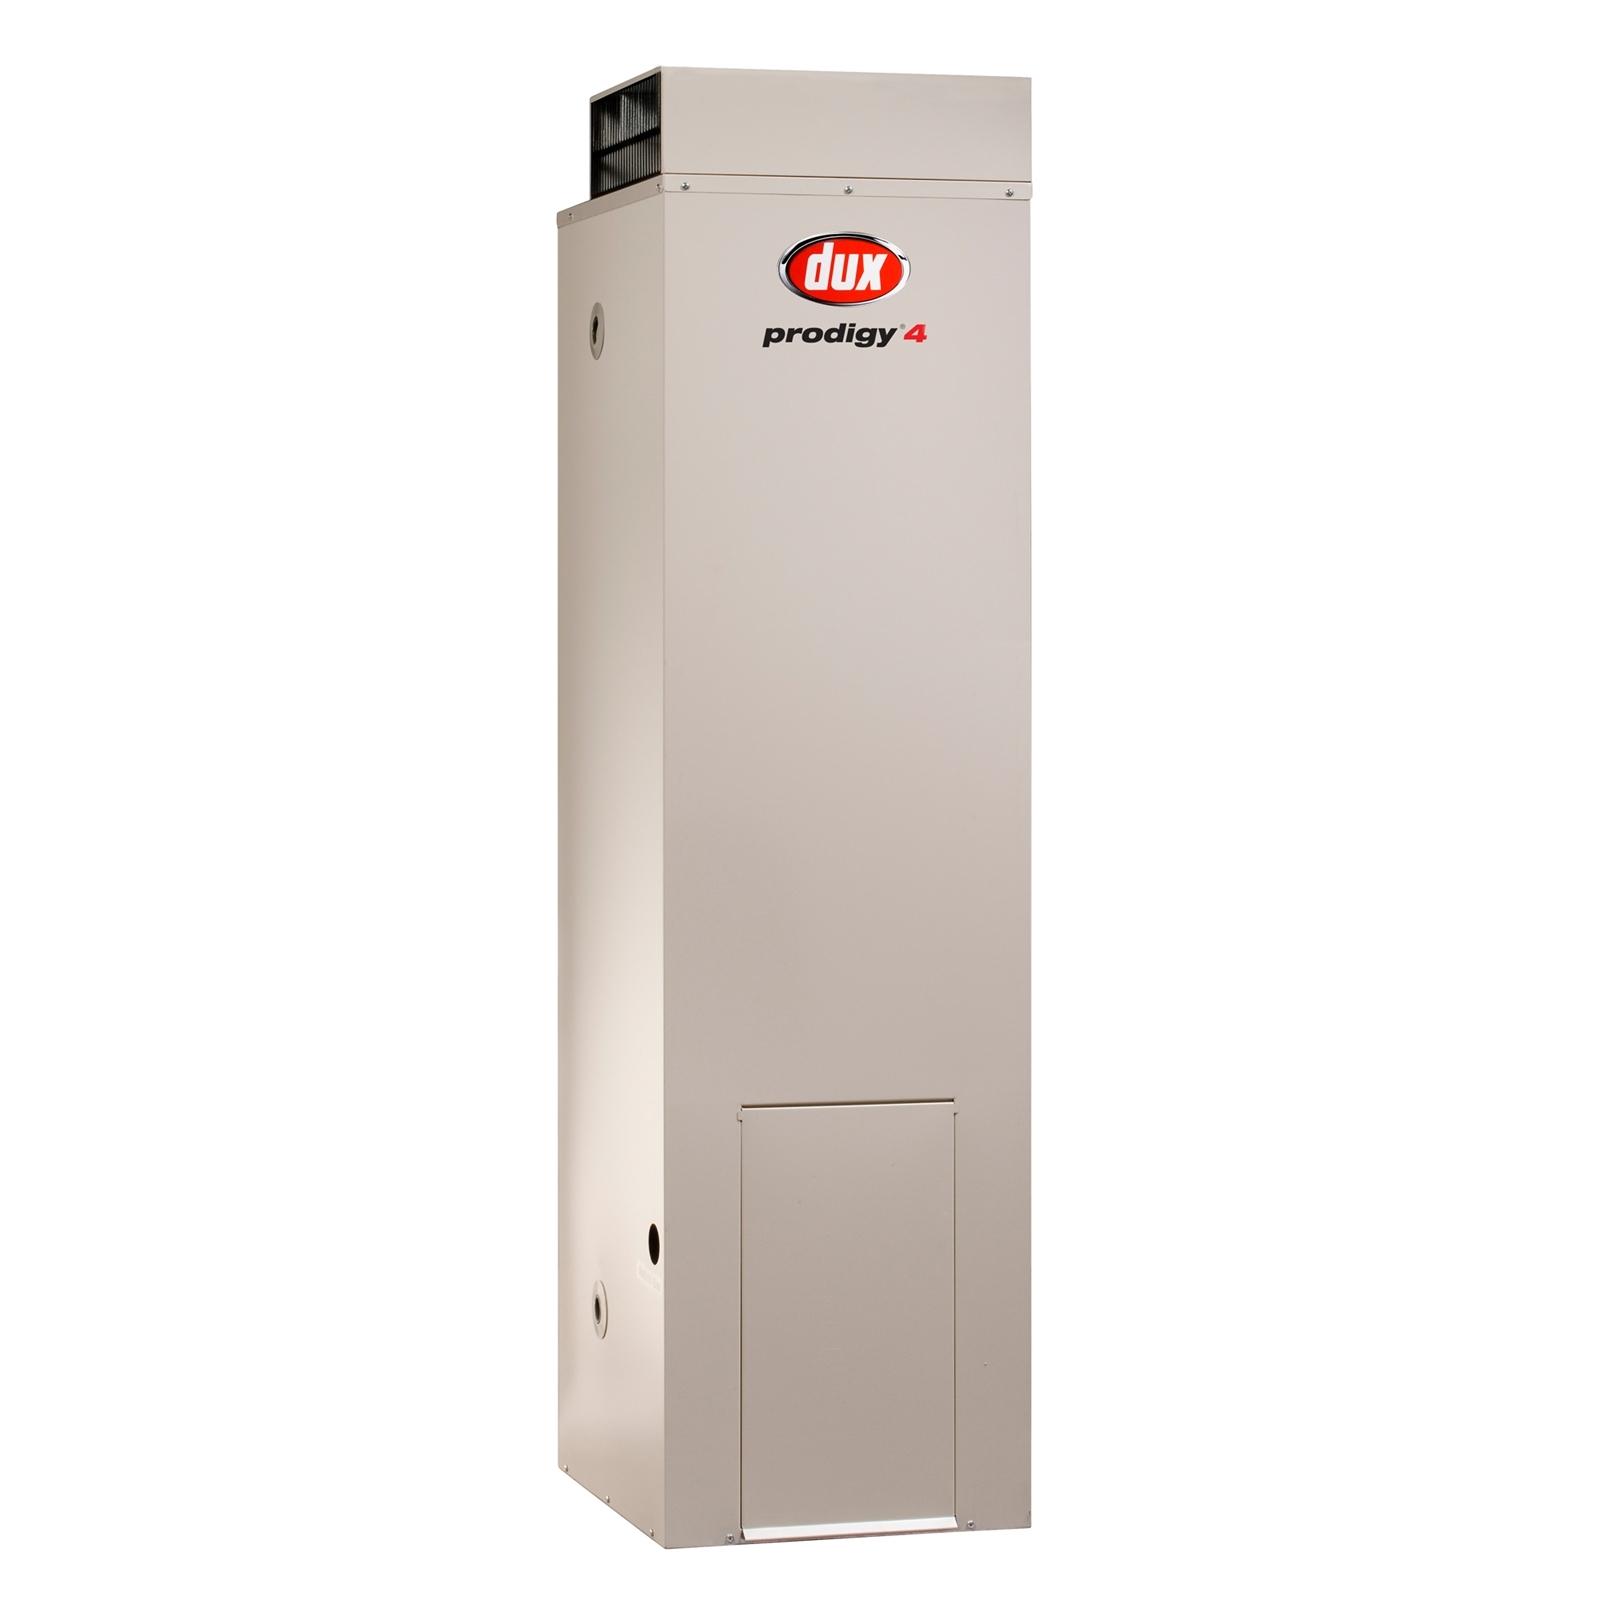 Dux 135L 4 Star Prodigy Water Heater - LPG